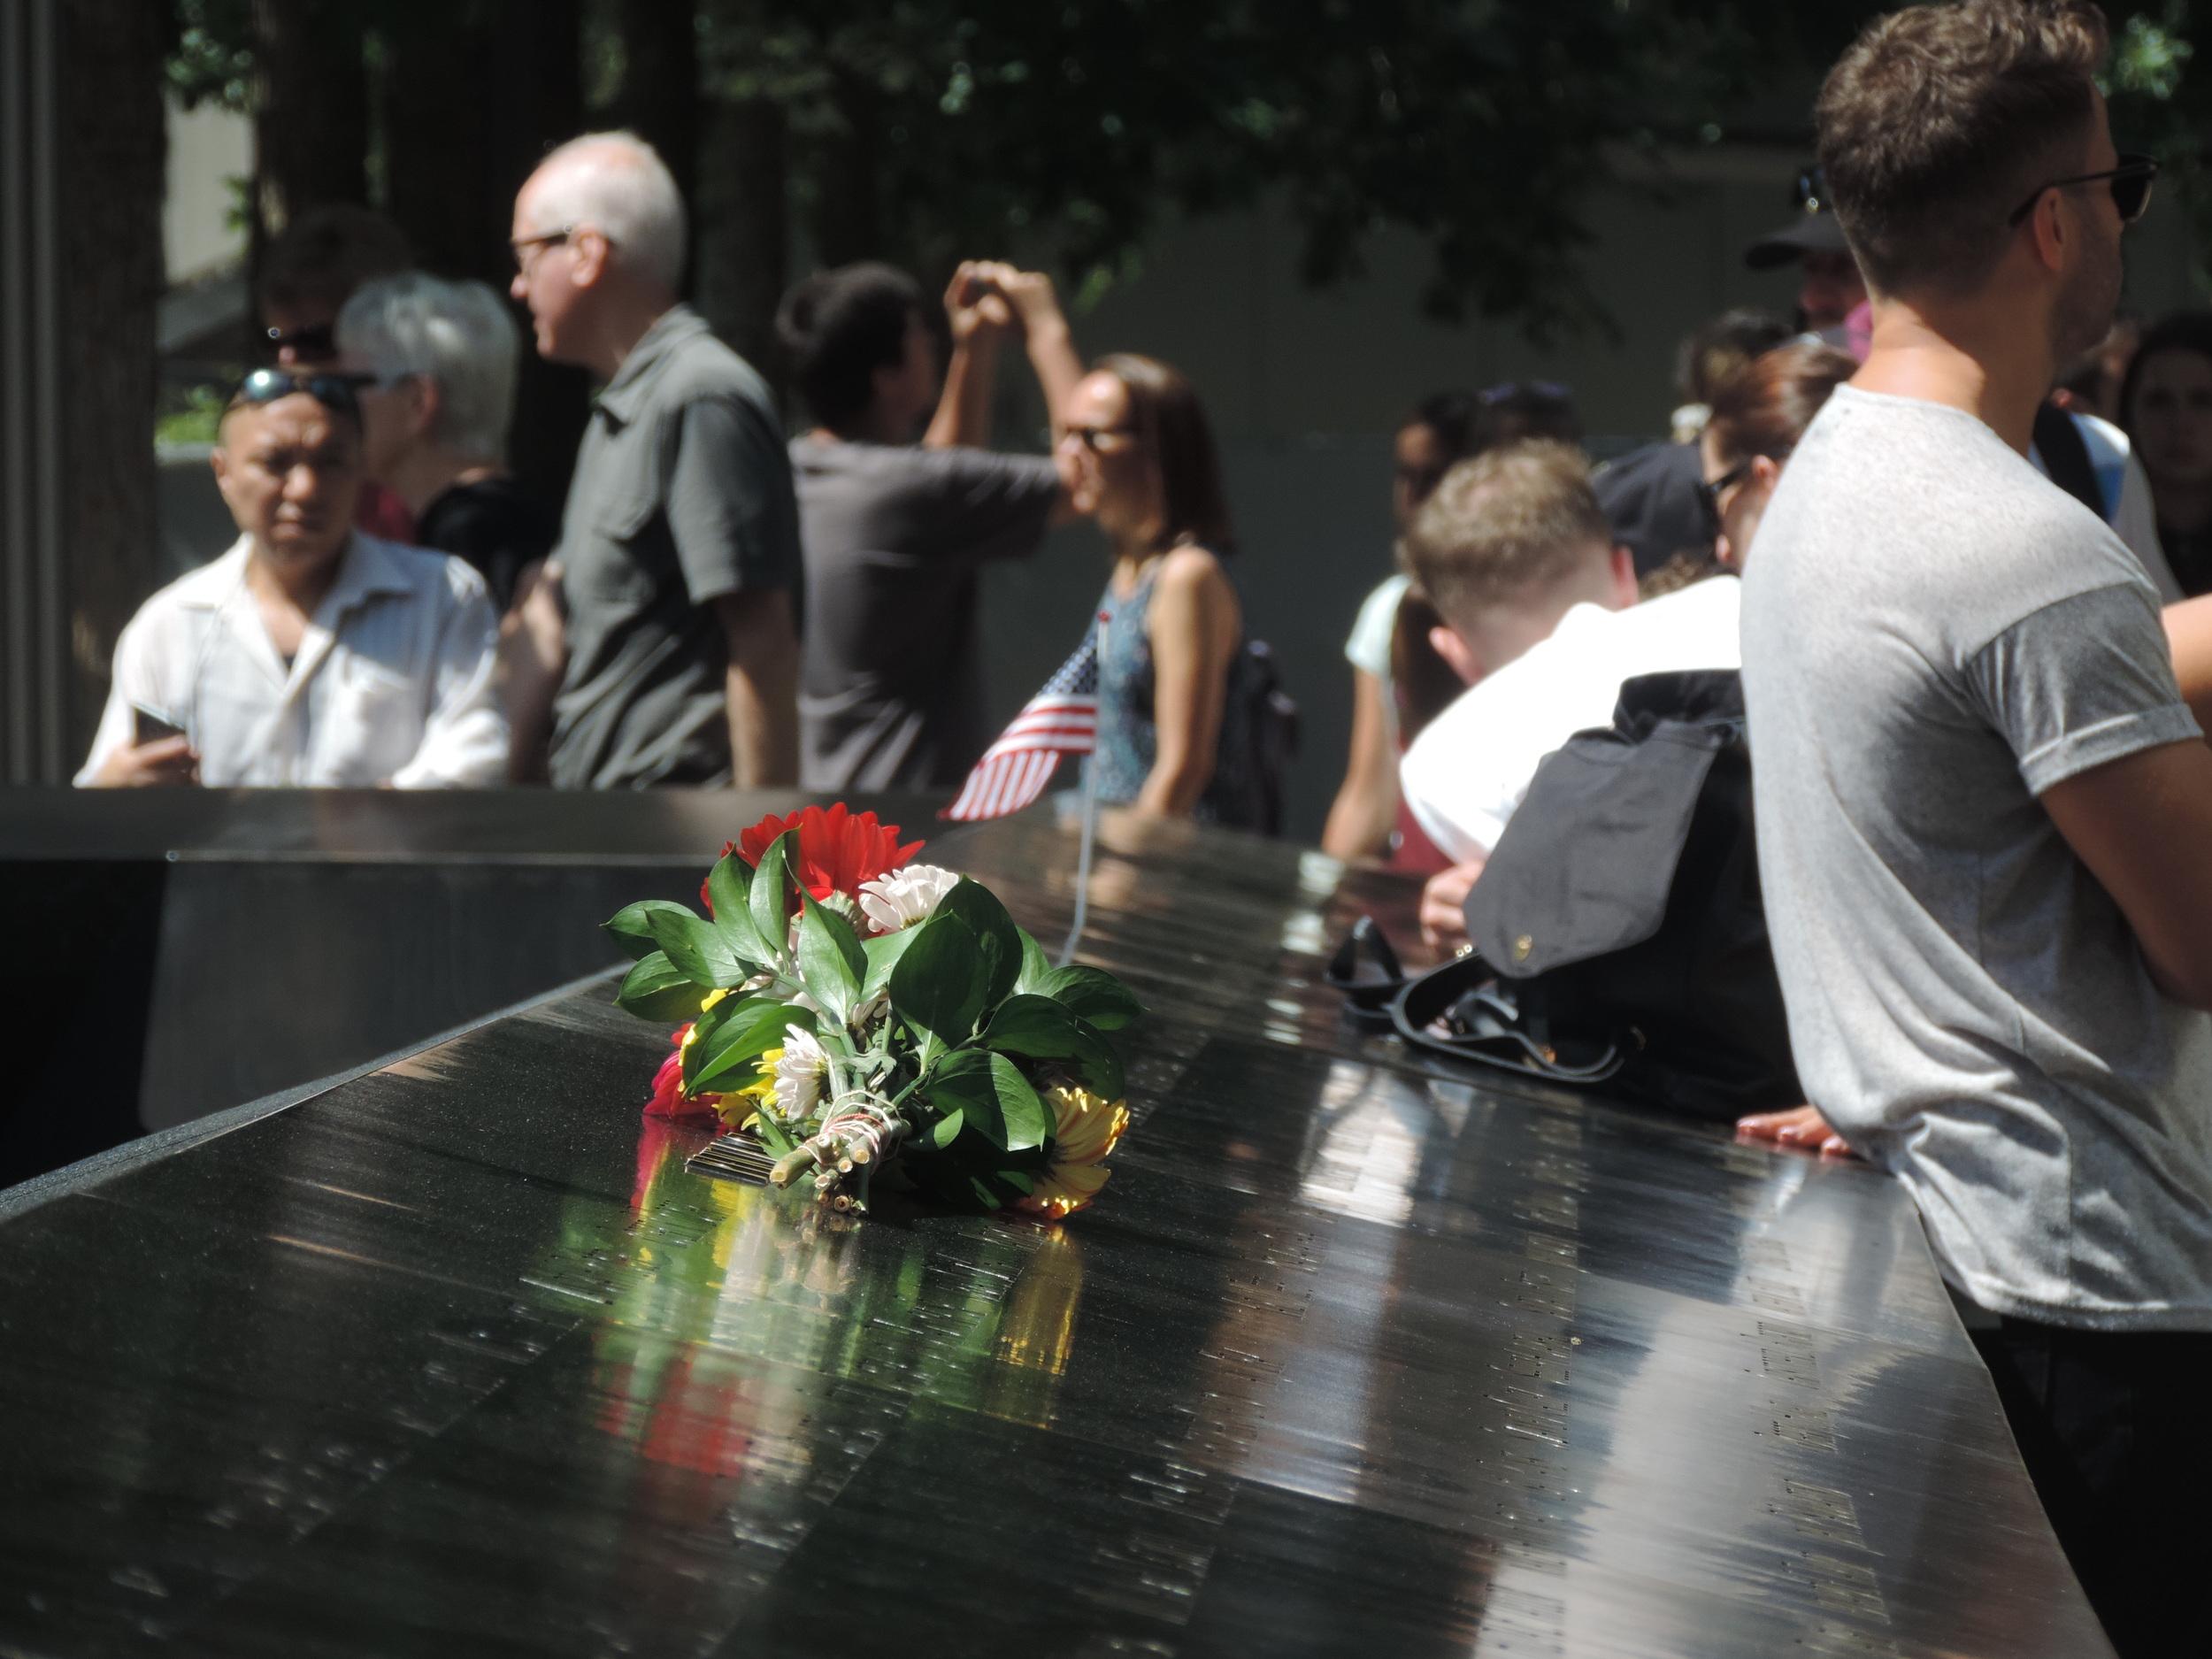 Copy of 911 rememberance.JPG